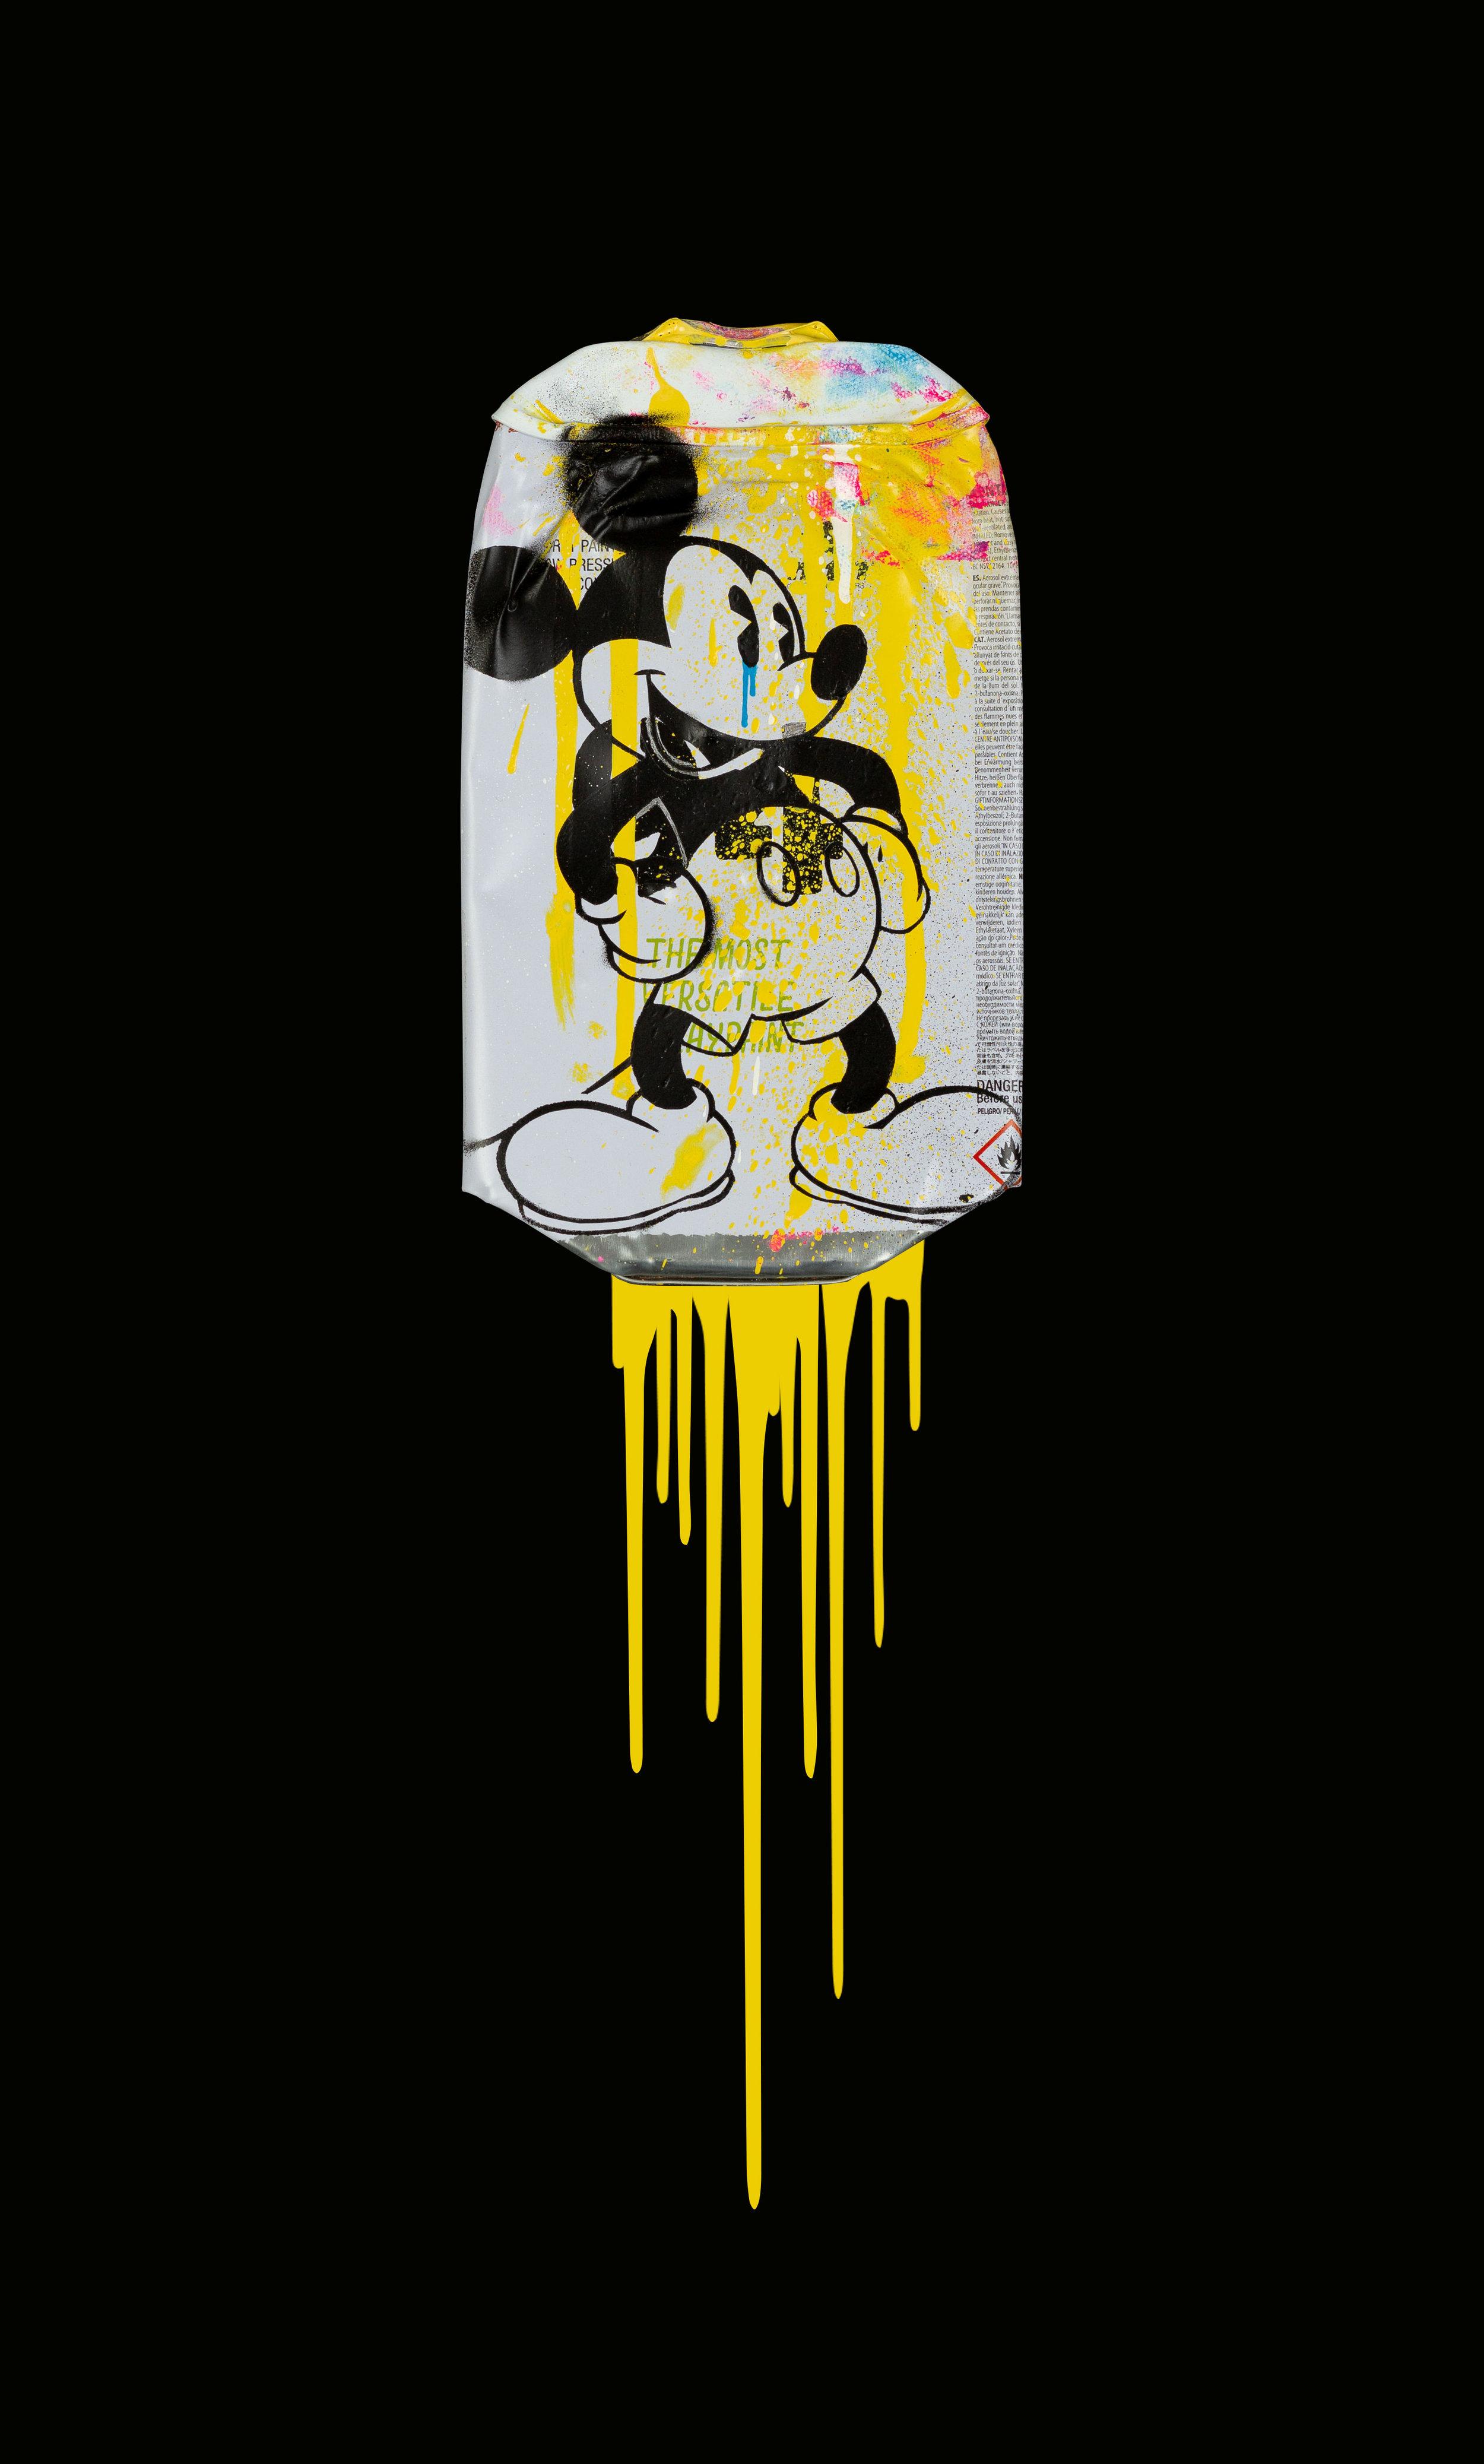 Mickey-Montana-94-Light-Yellow-Acrylic-Spray-paint-on-crushed-spray-can-in-museum-perspex-box-frame-27.5cm-x-45cm-x-5.5cm-£725.jpg